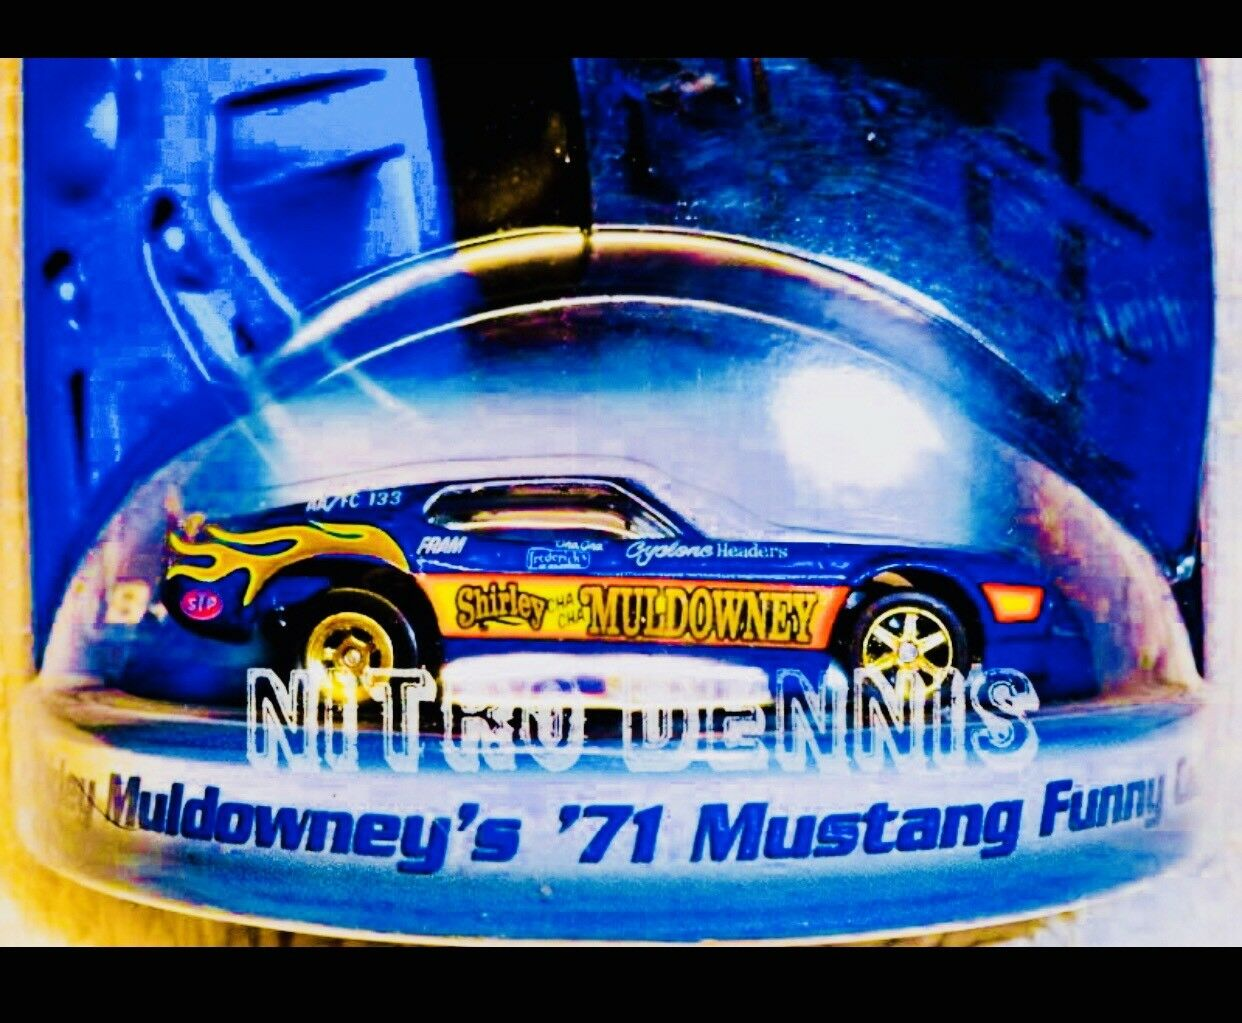 NHRA Shirley Muldowney 1 64 TOP FUEL Nitro Drôle  Voiture IHRA Drag Racing Adra  achats en ligne et magasin de mode